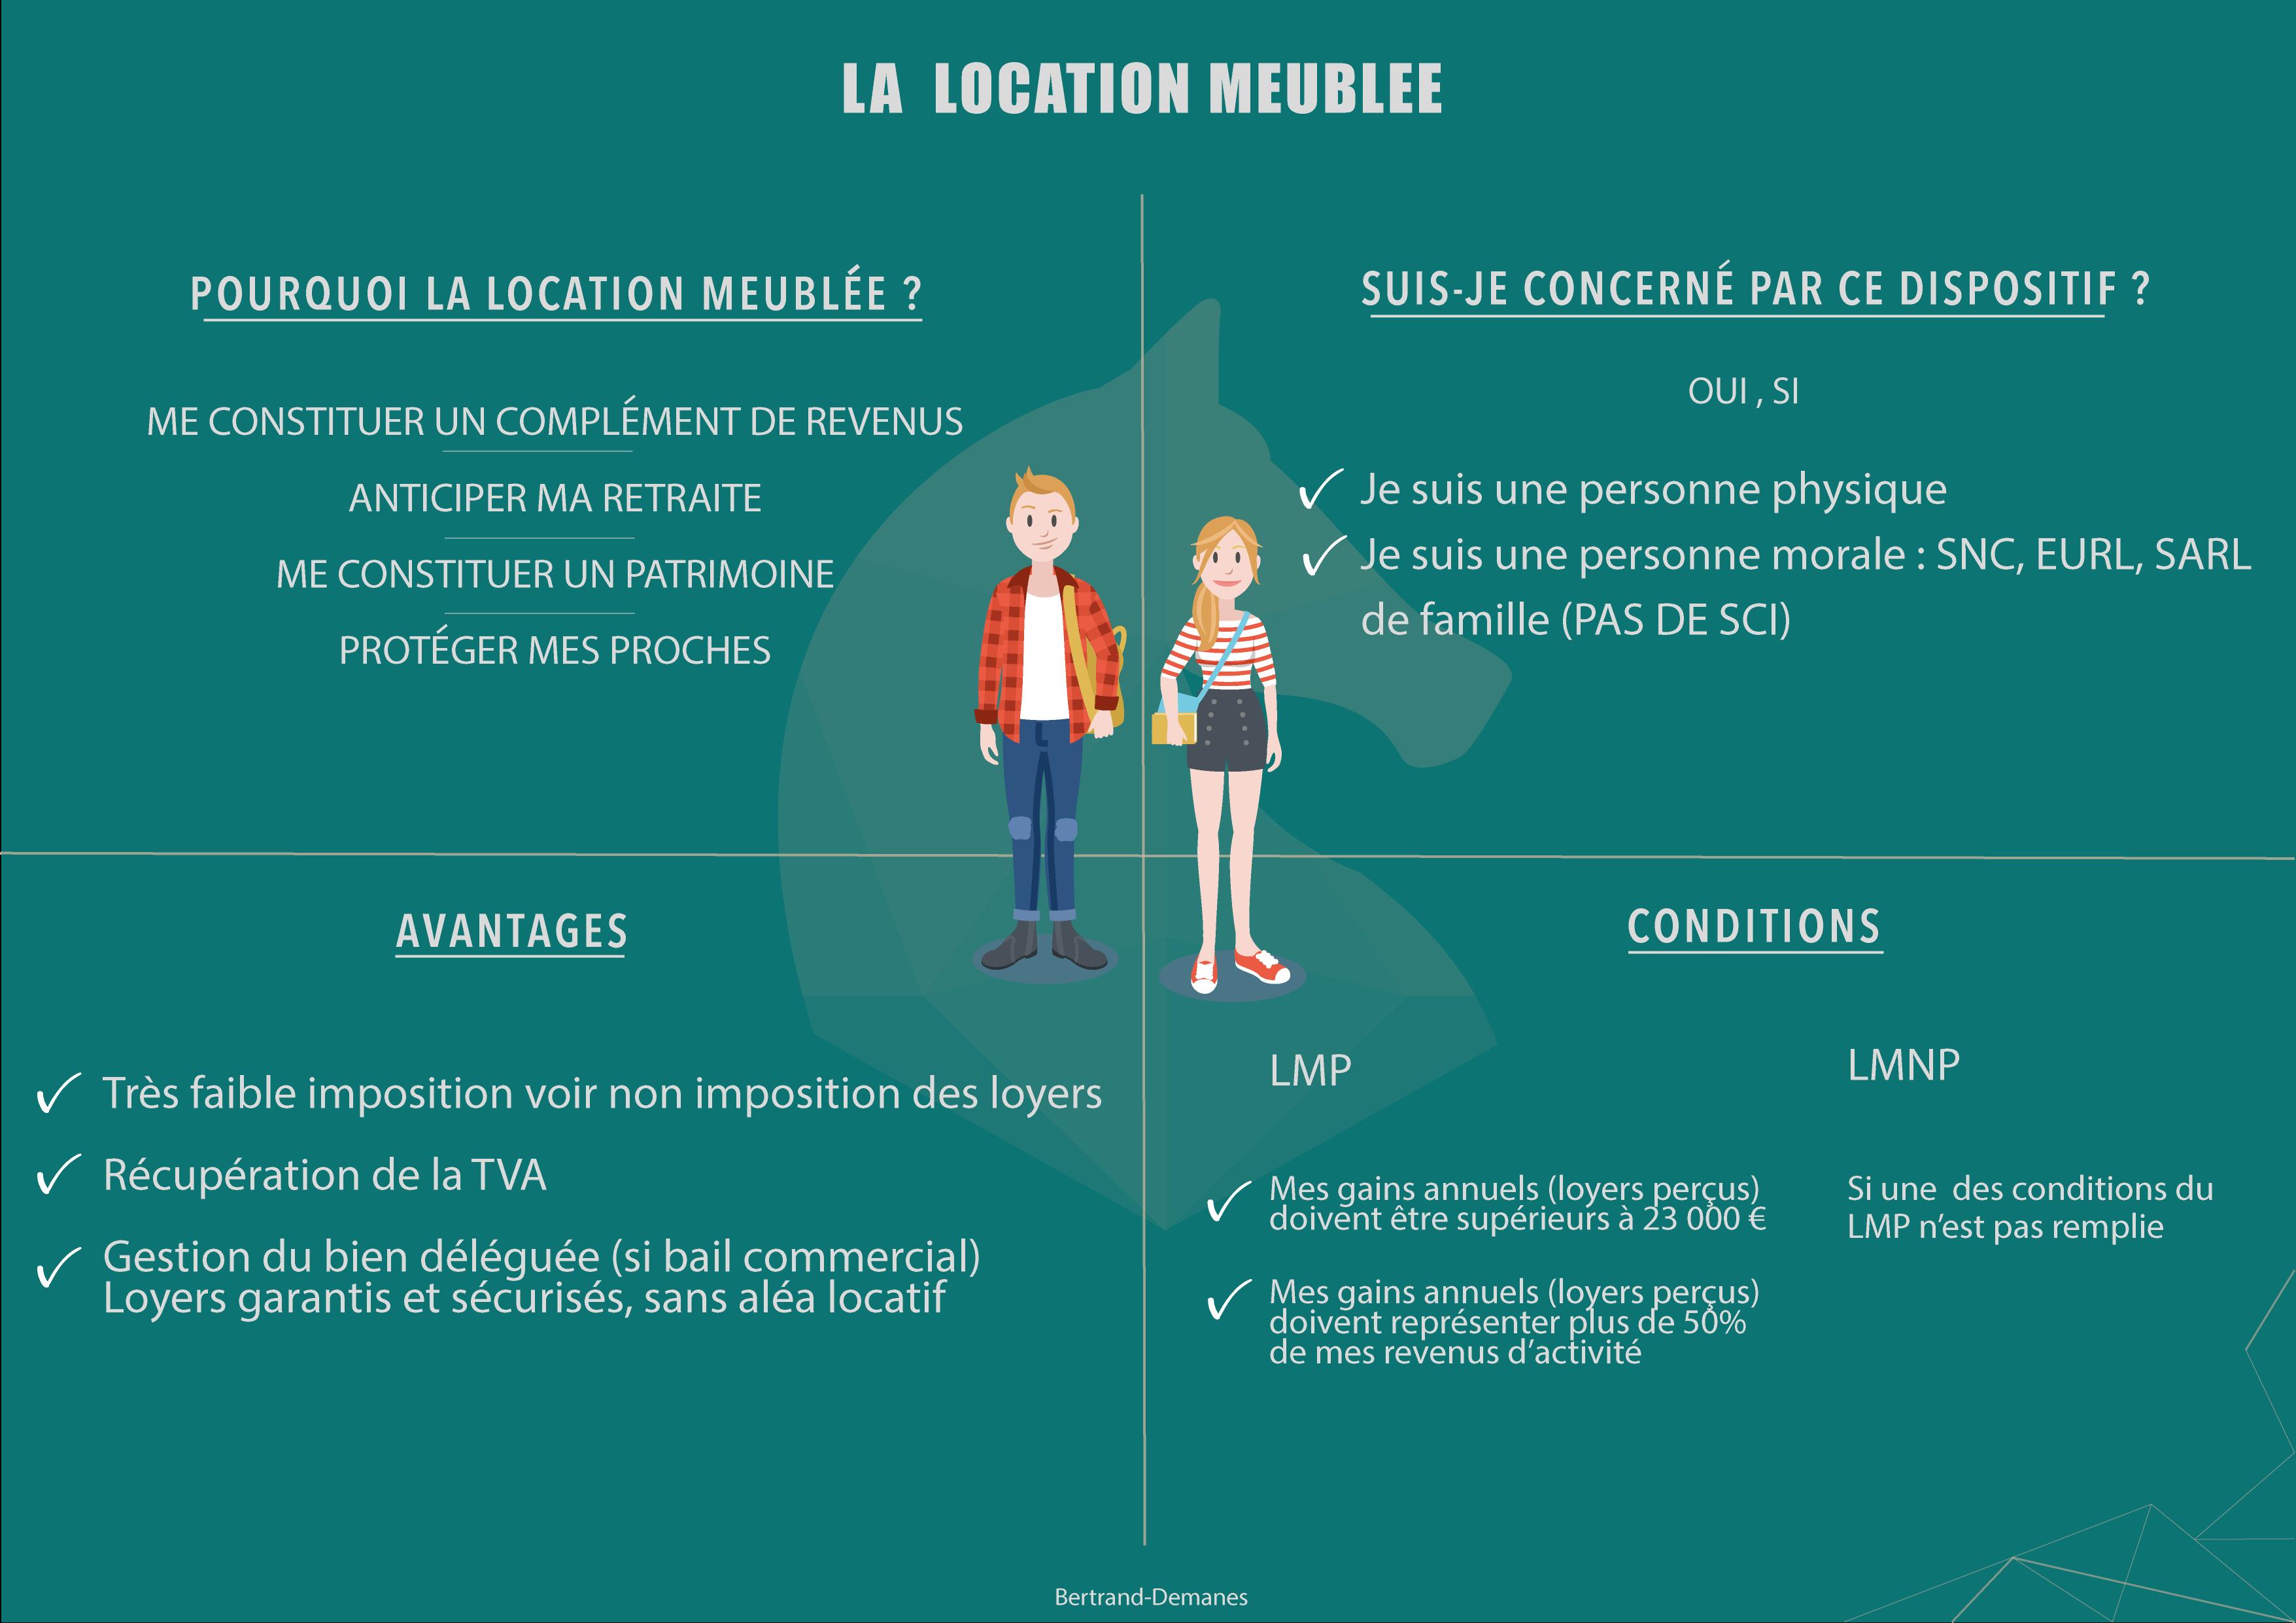 infographie-location-meublee-angers-bertrand-demanes